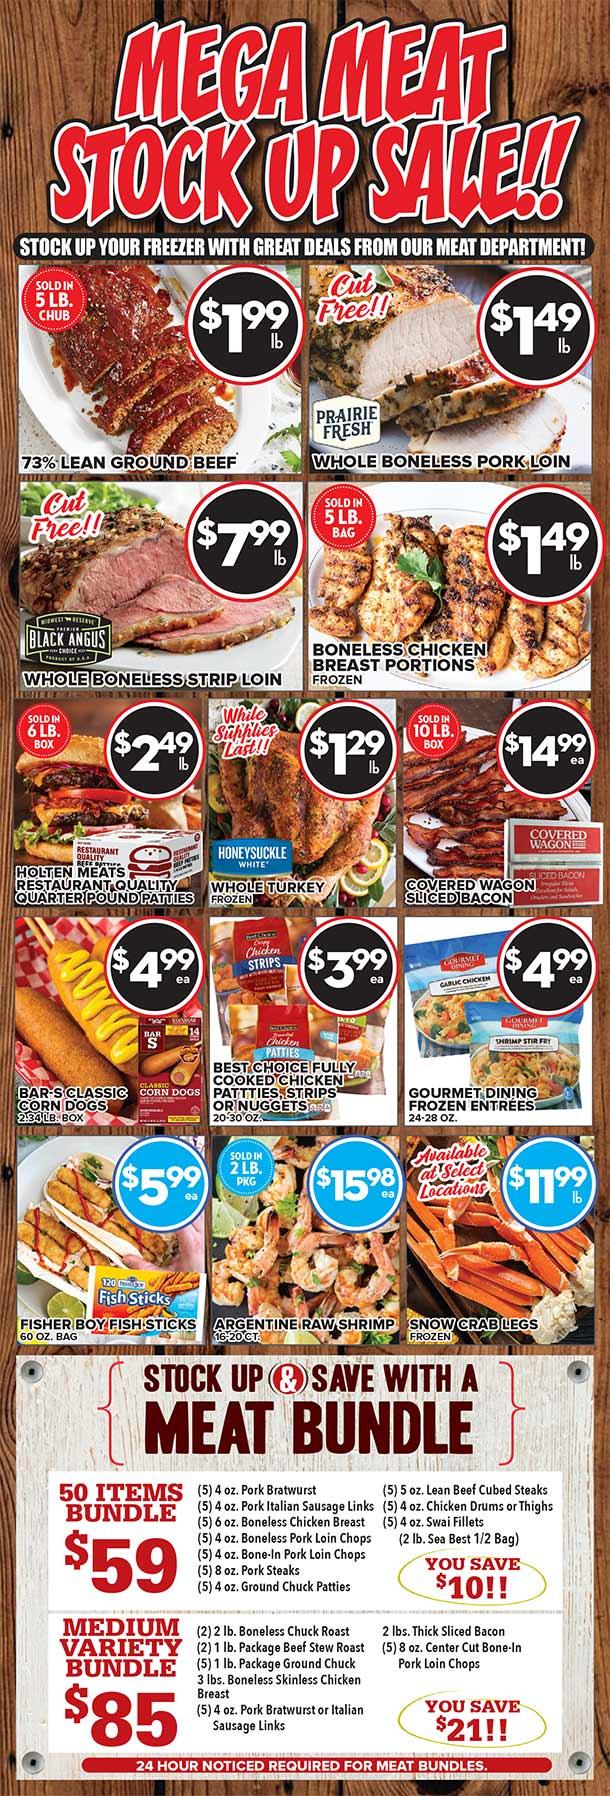 Mega Meat Stock Up Sale